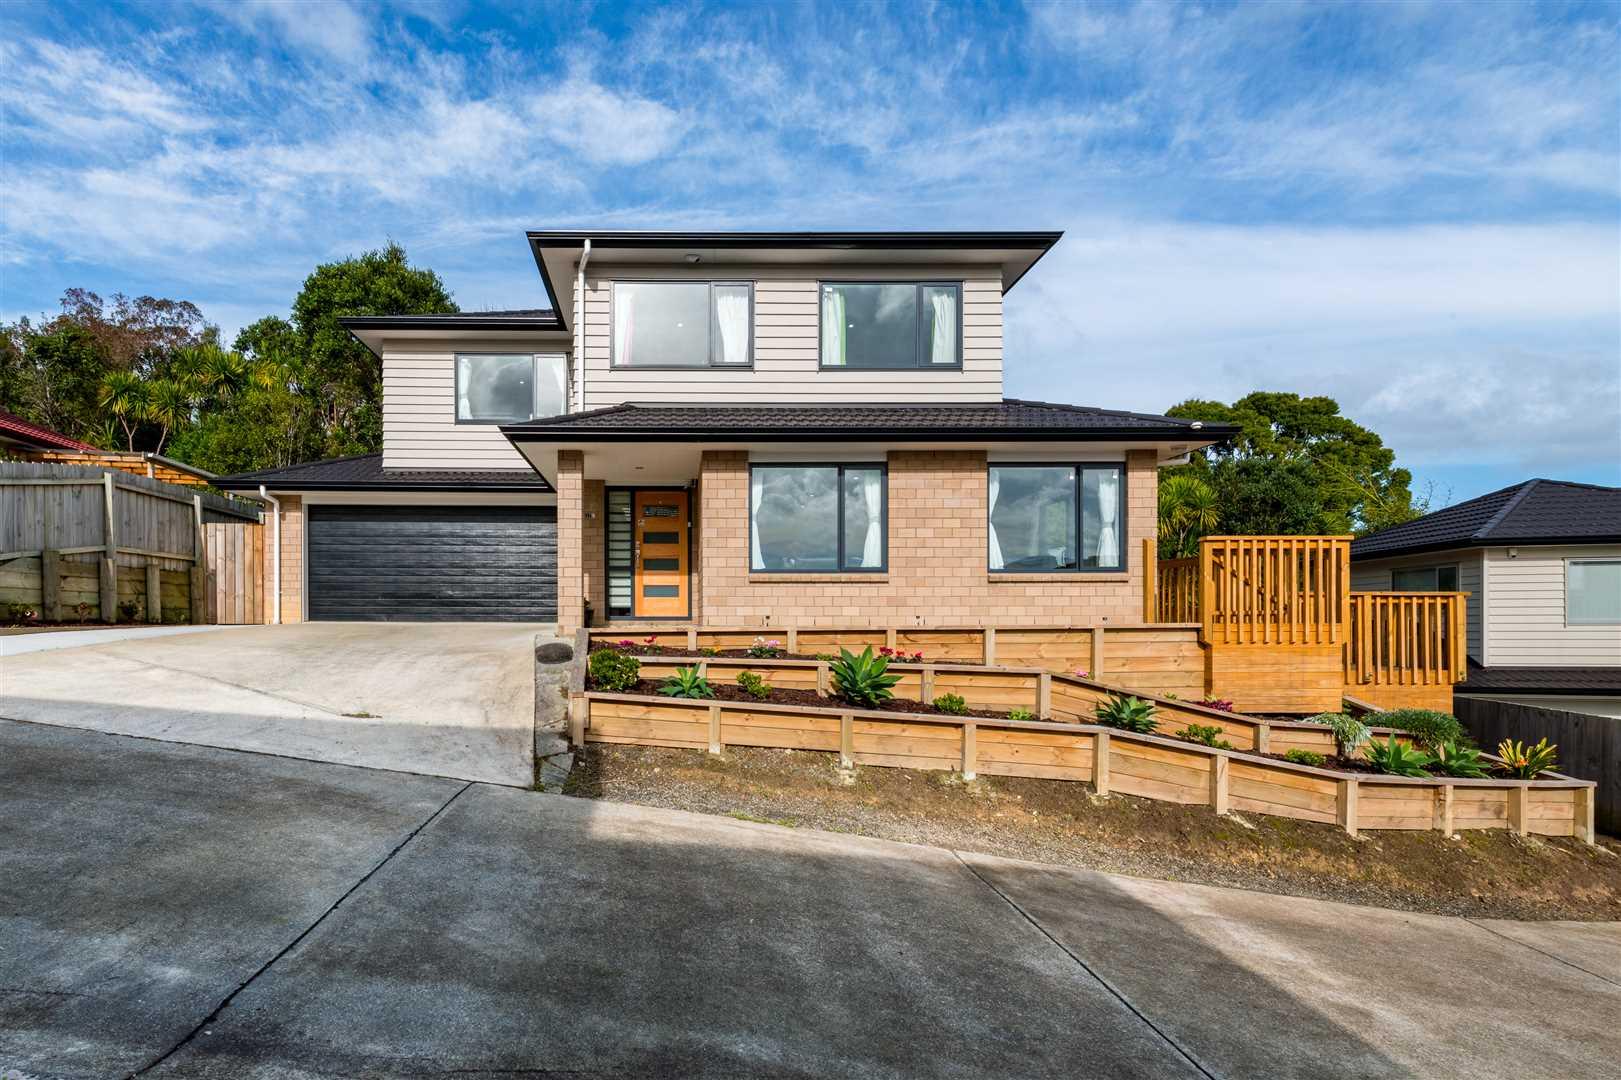 Modern Easy Living - Vendors Moving to Flat Bush